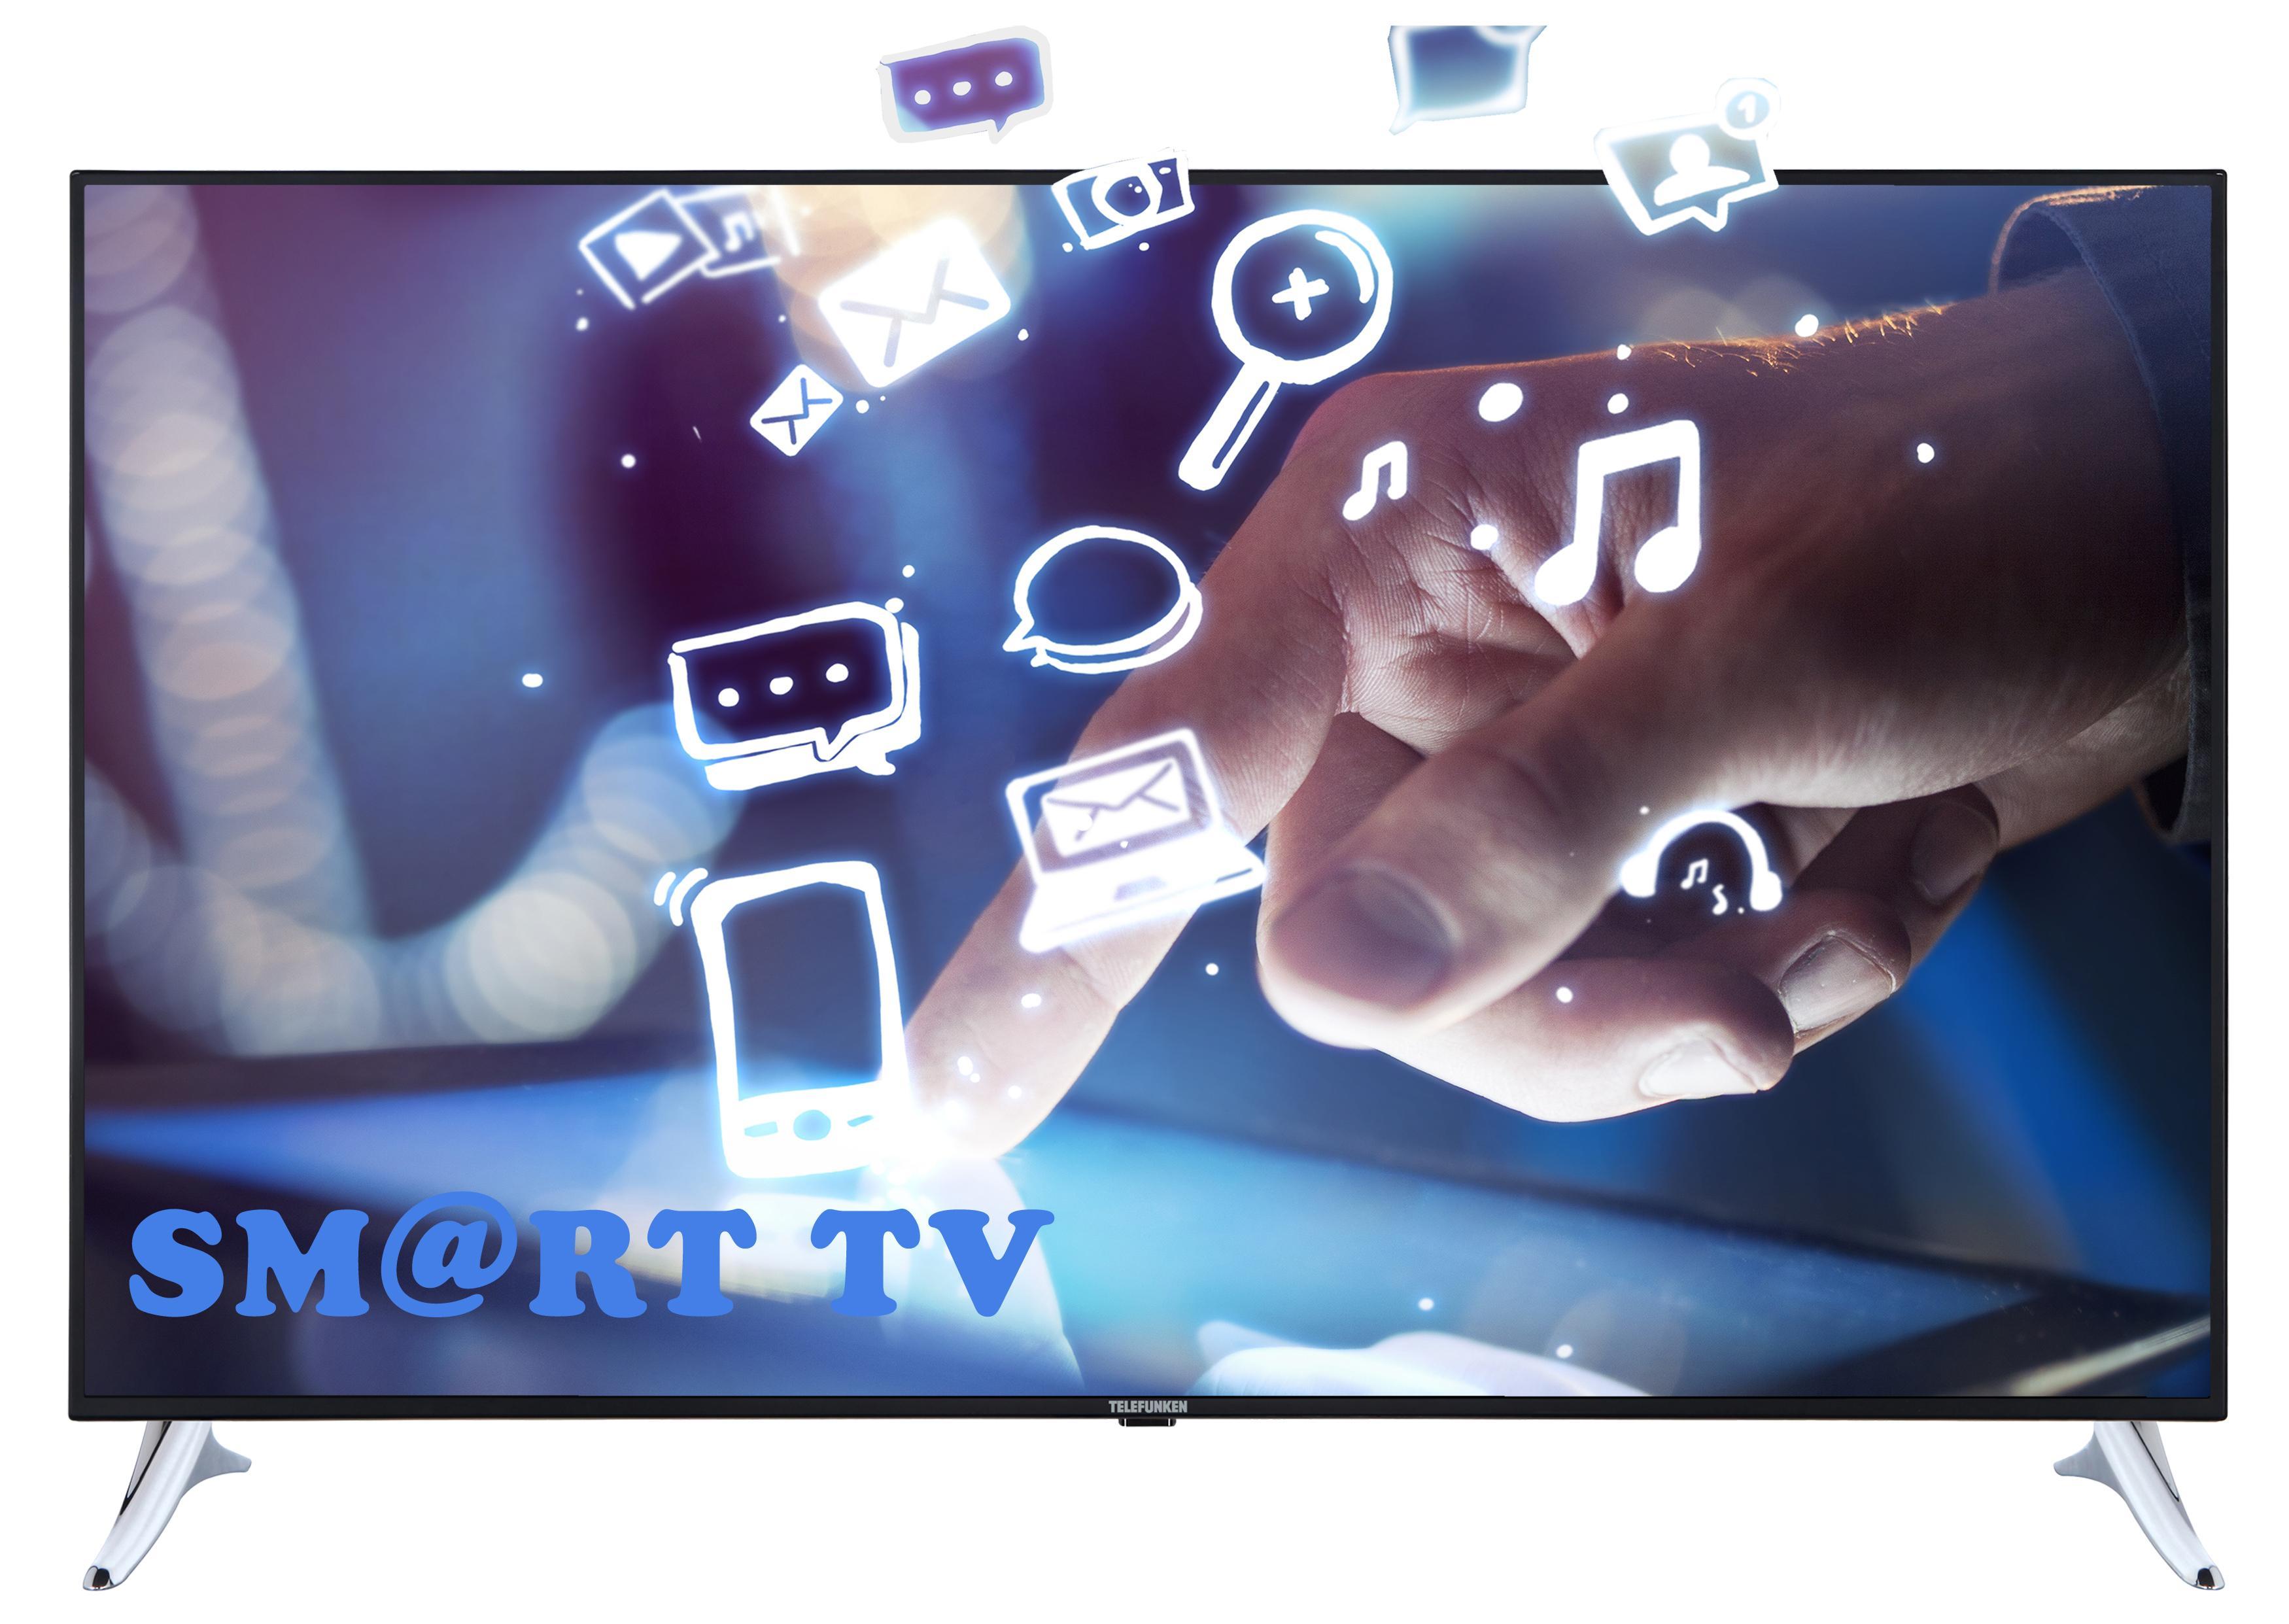 Amazon-Angebote am 20.3.: 65 Zoll UHD-Fernseher, Gaming-PC ideacentre mit GTX 1080